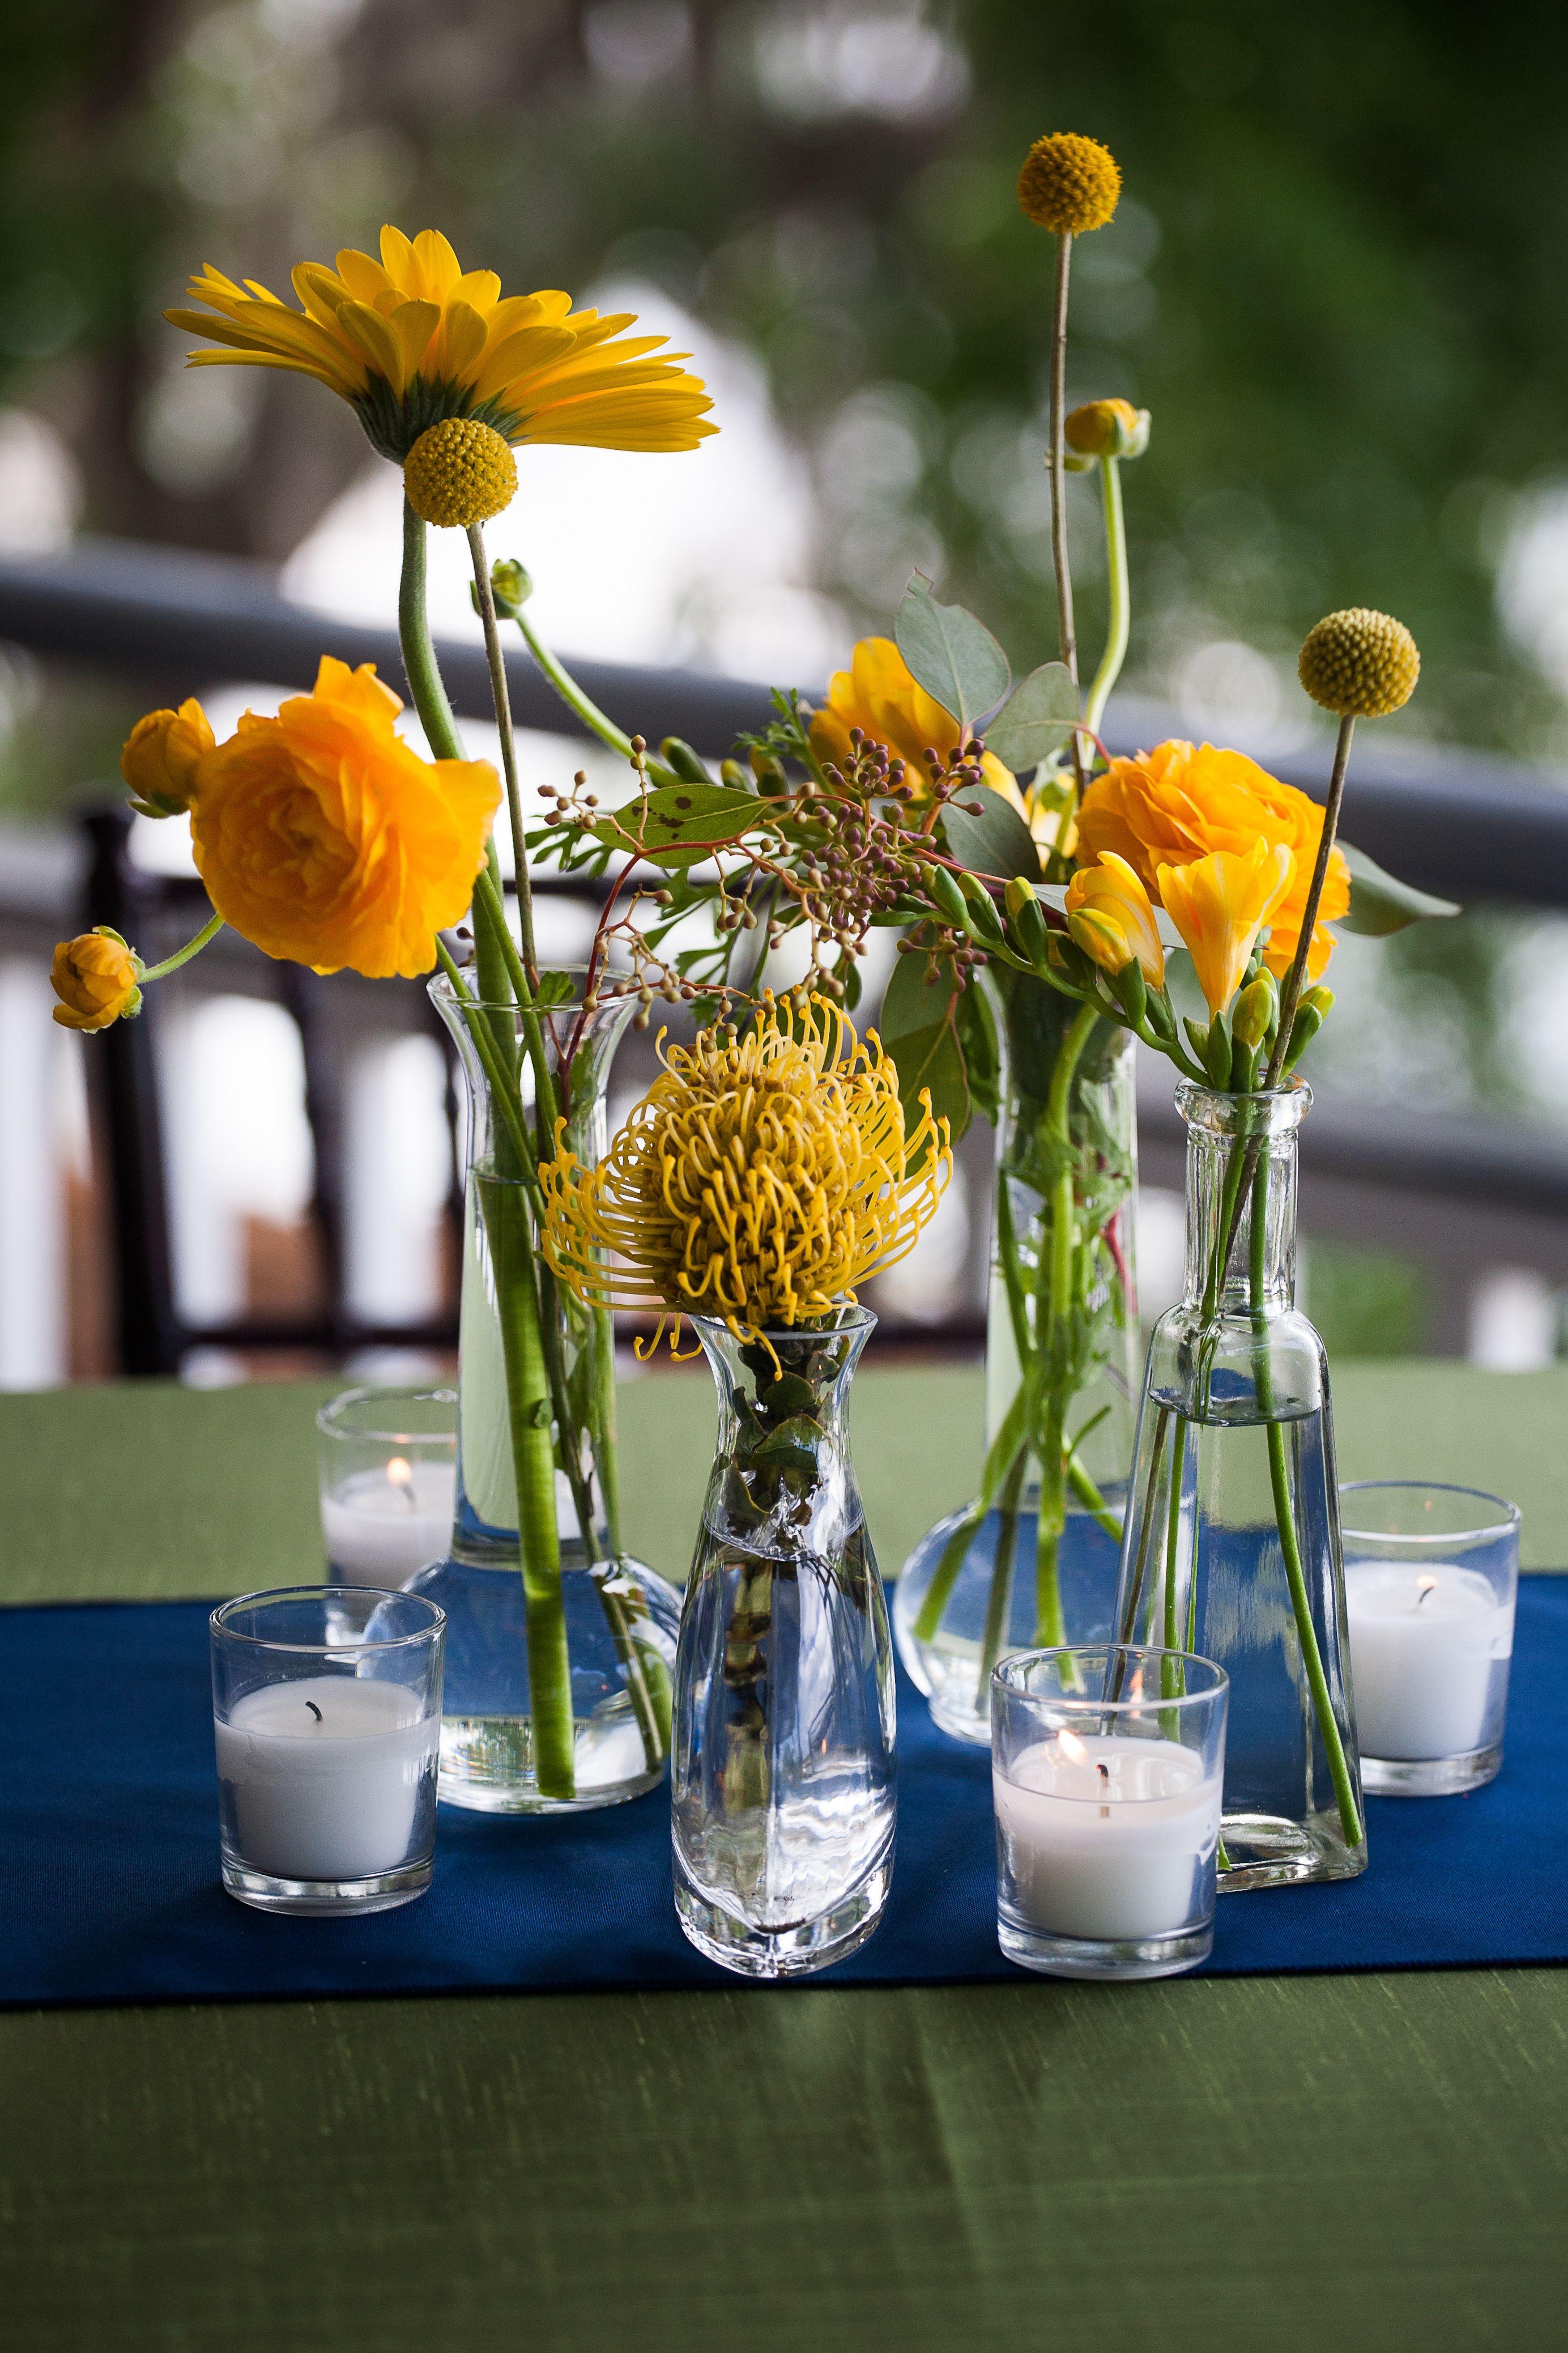 Yellow billy balls ranunculus pin cushion protea and gerber yellow billy balls ranunculus pin cushion protea and gerber daisies in bud vases reviewsmspy